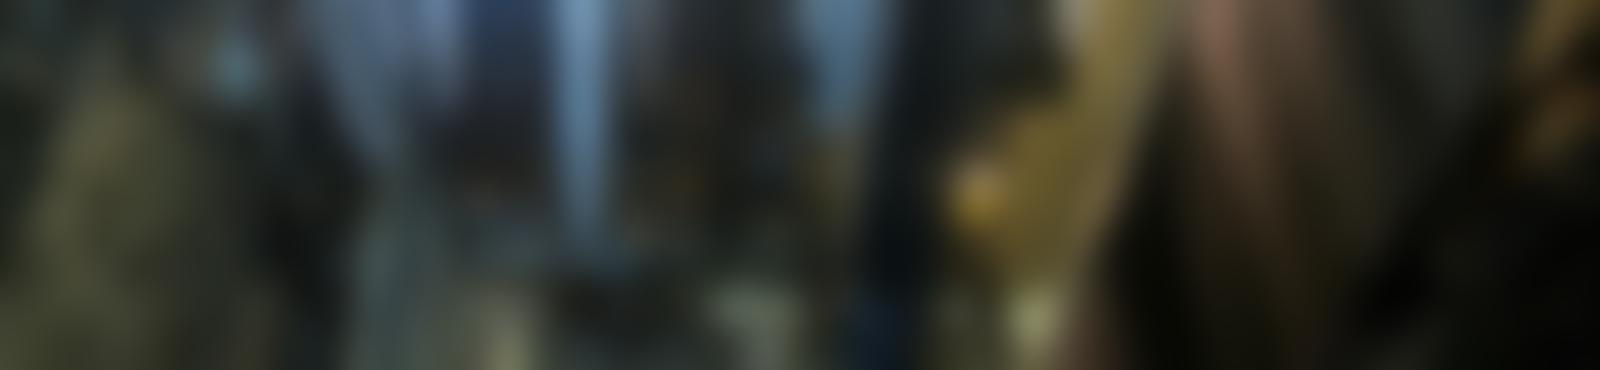 Blurred acf60030 3bd8 43ee 8d2a 255066b69a93